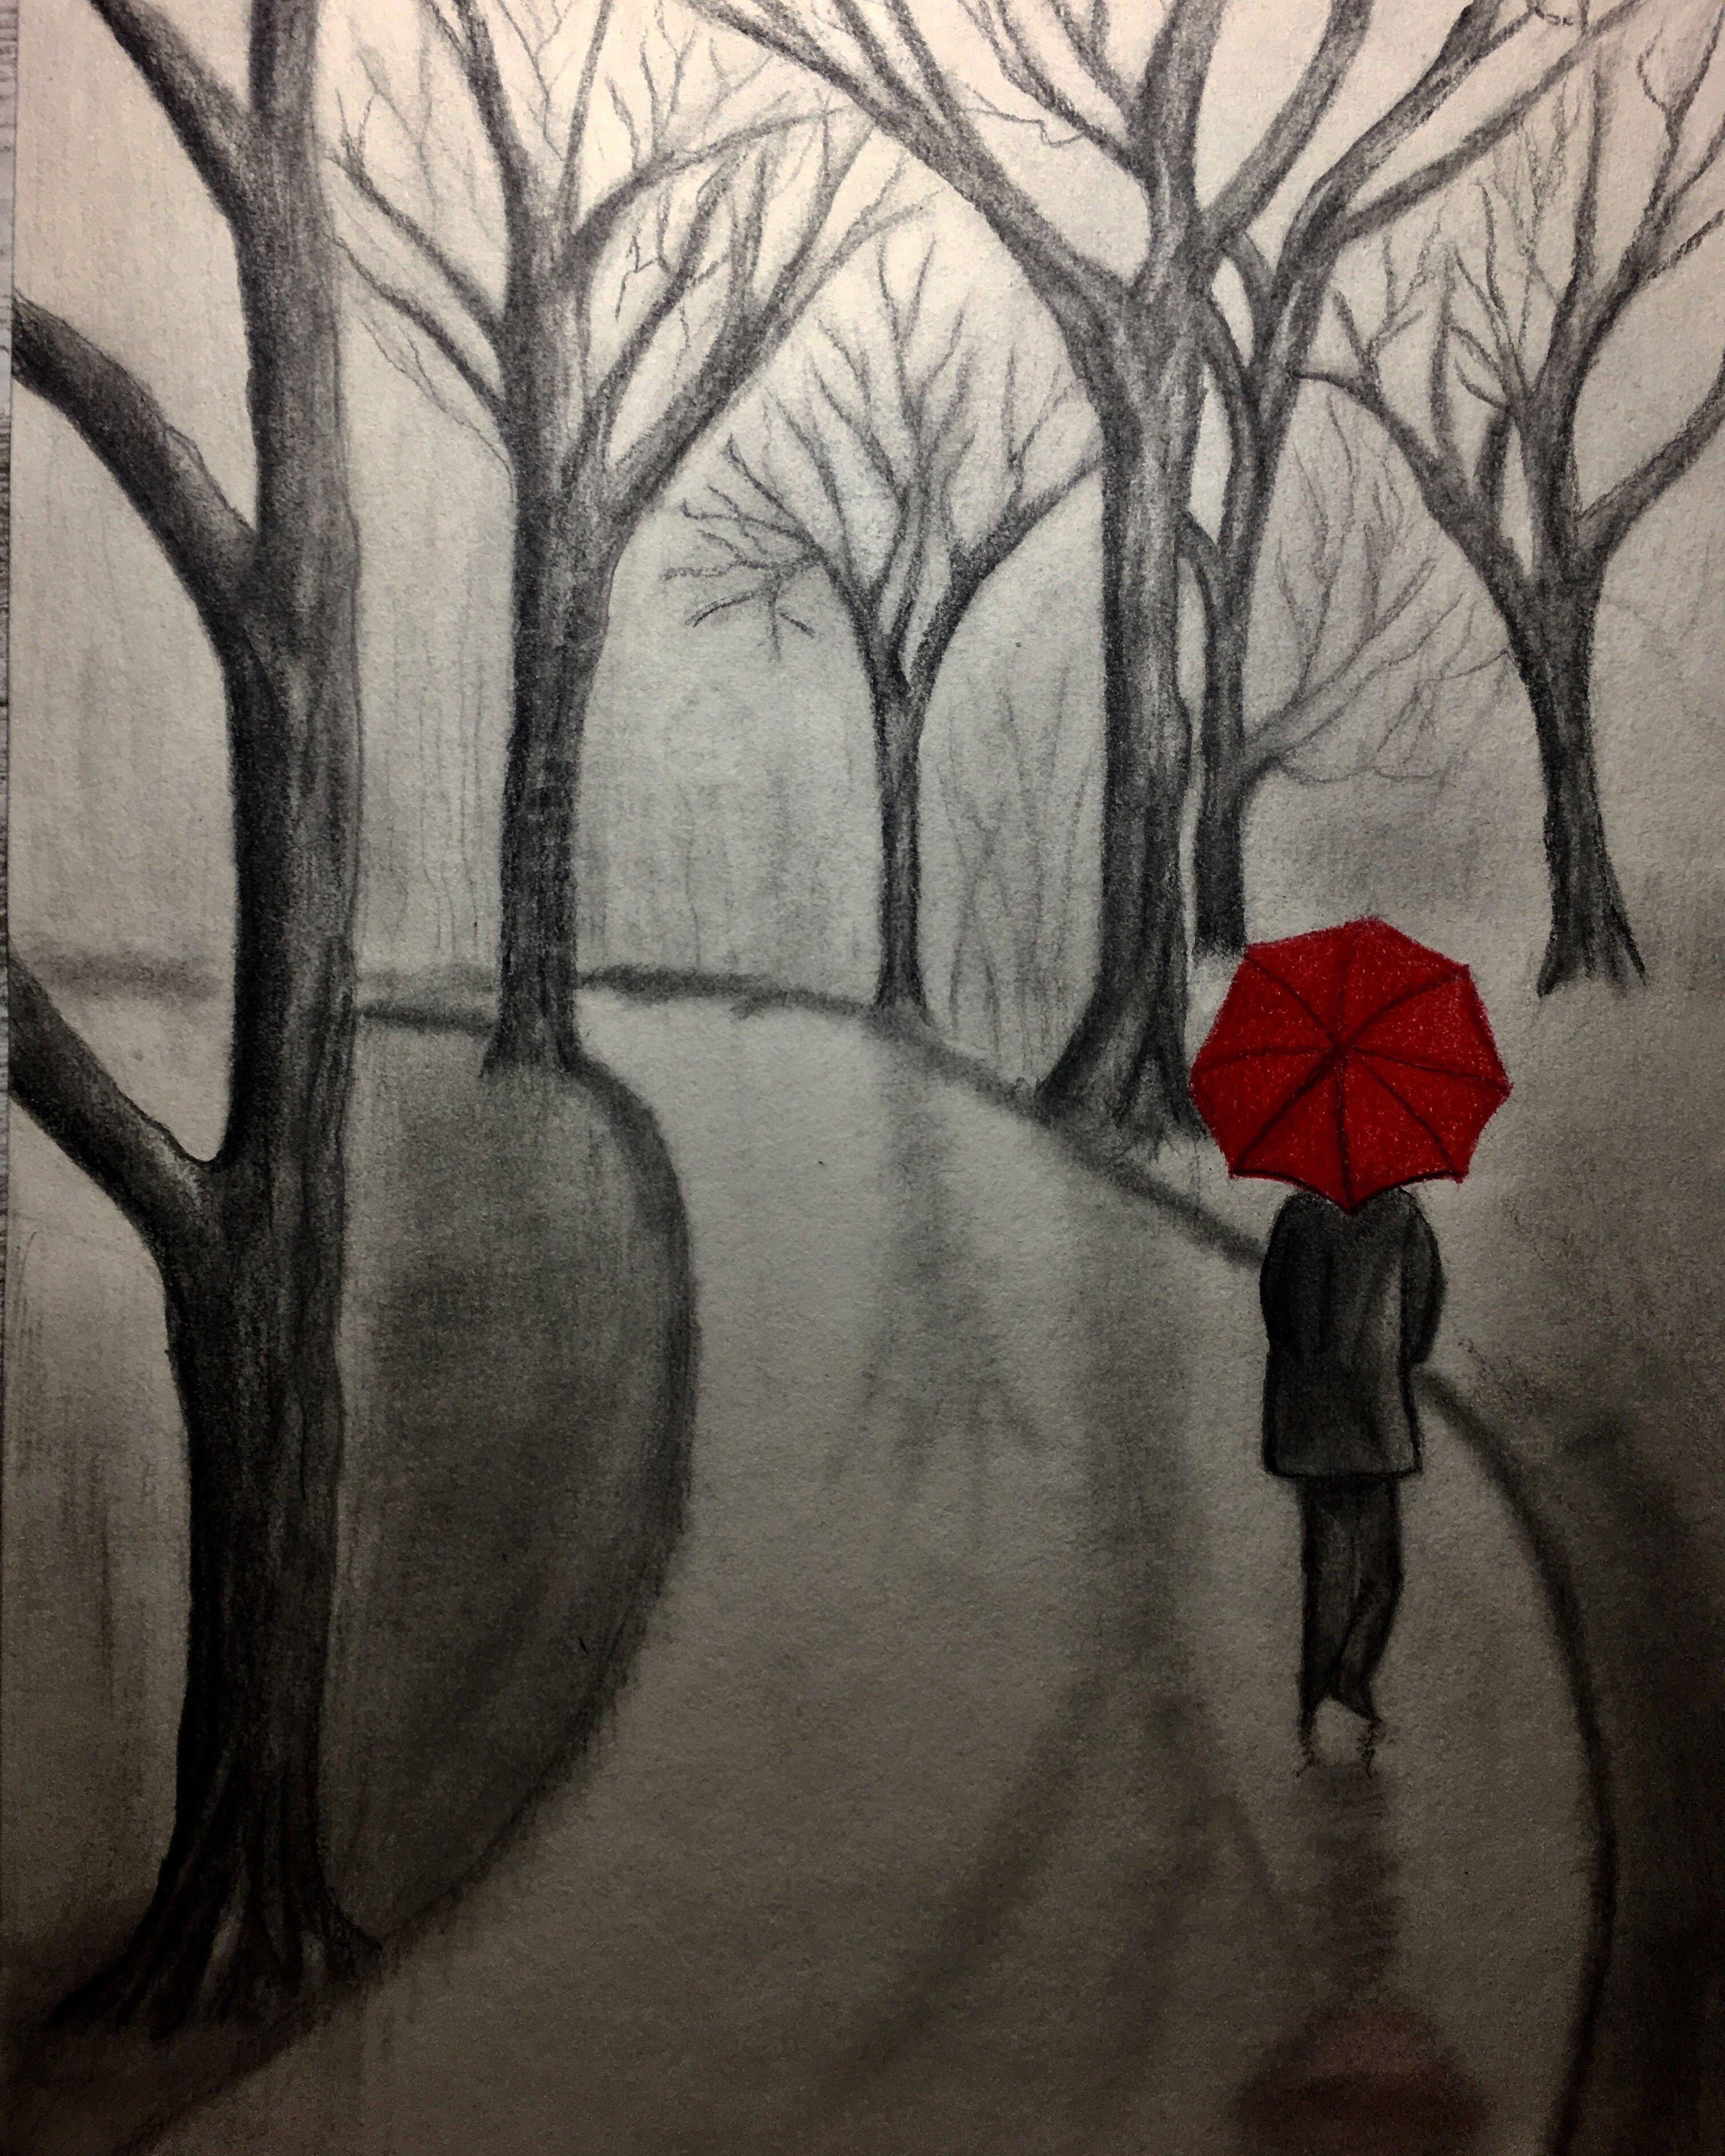 #drawing#karakalem#ağaç#şemsiye#yol#resim